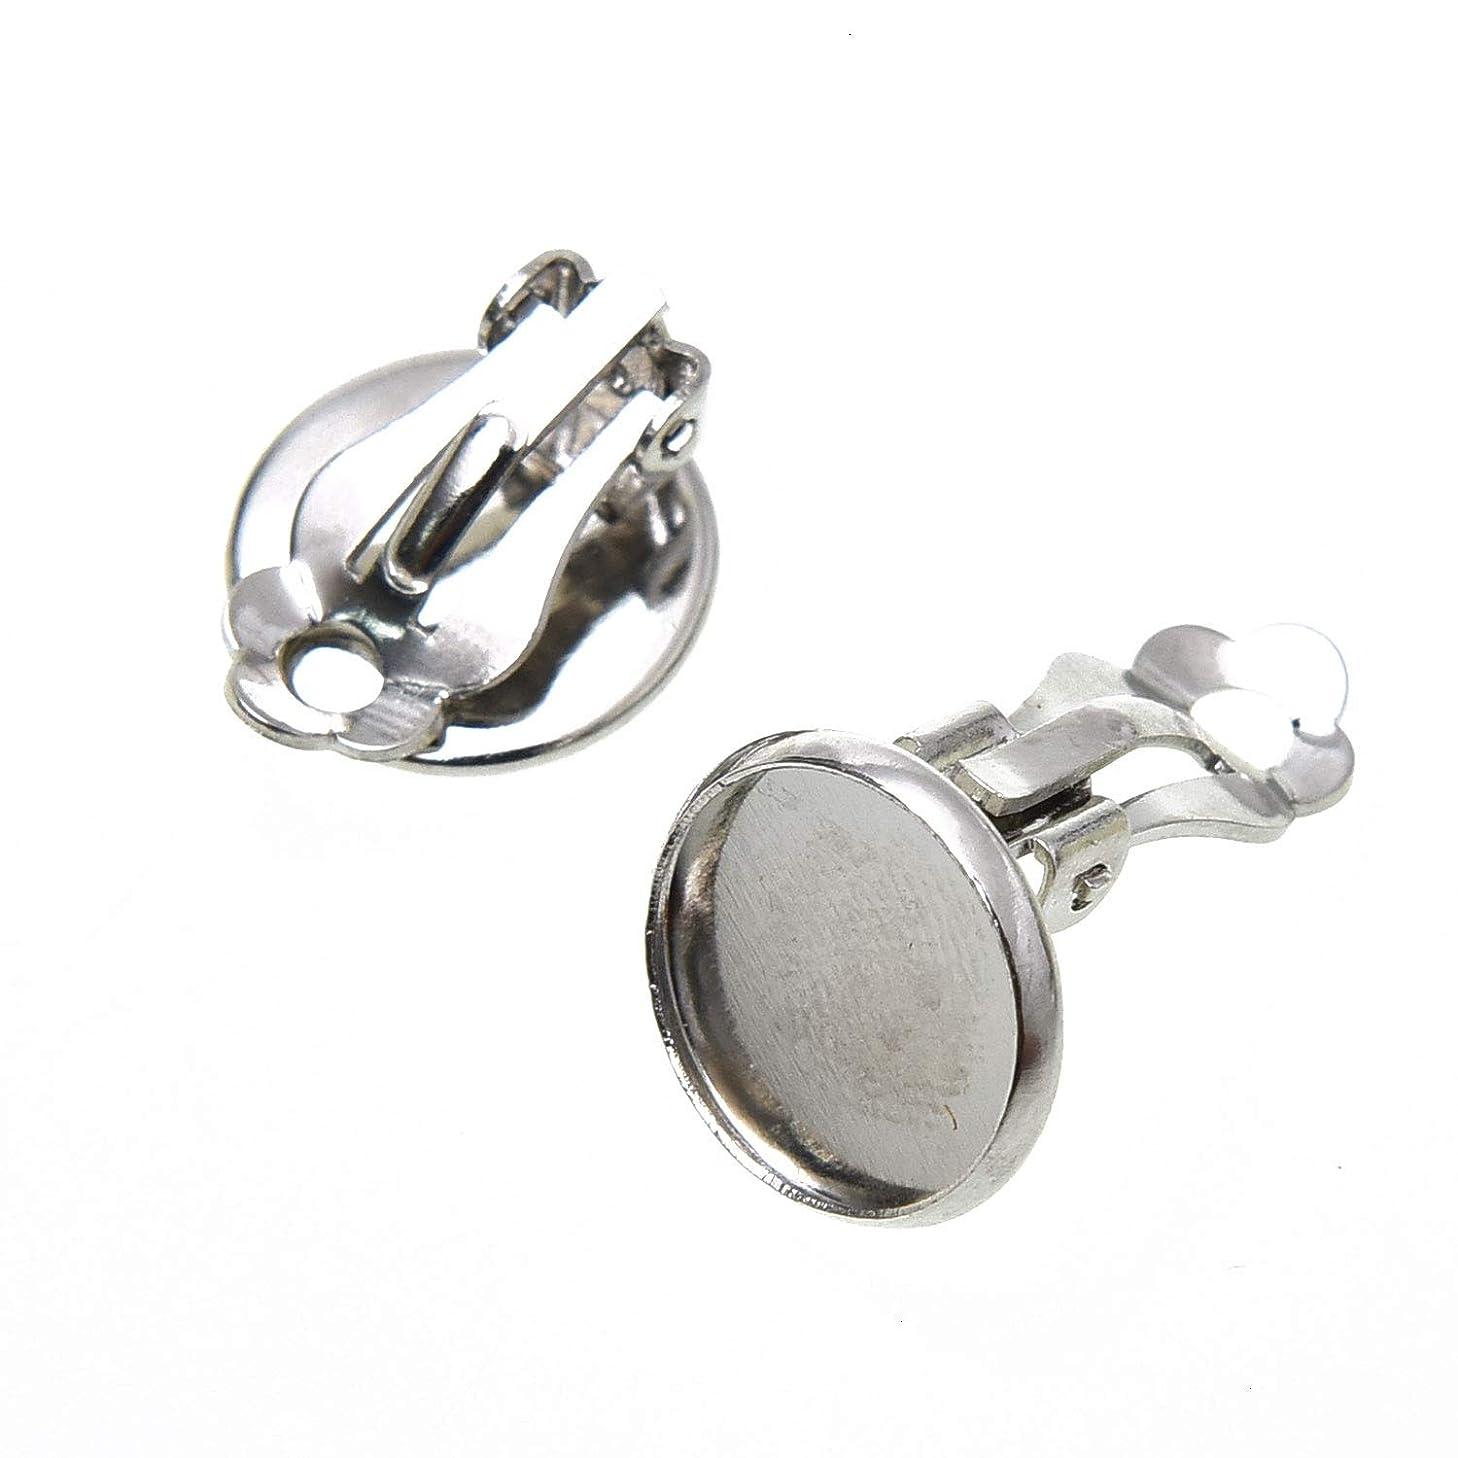 Monrocco 30Pcs Round Tray Bezel Blank Flat Back Bezel Earring Findings Tray Bezel Setting for Jewelry Accessories - 12mm